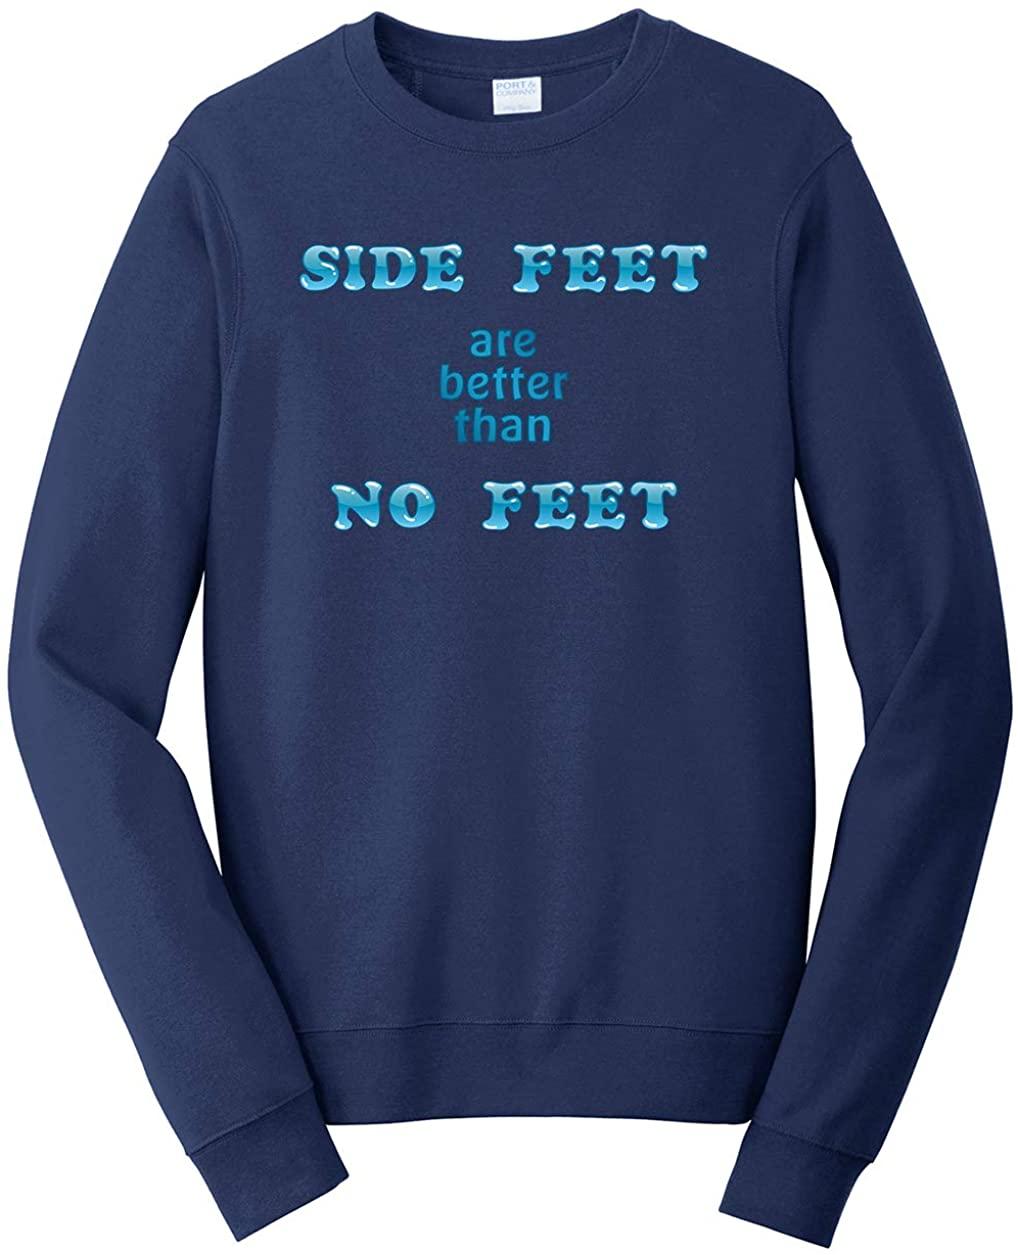 Tenacitee Men's Side Feet are Better Than No Feet Sweatshirt